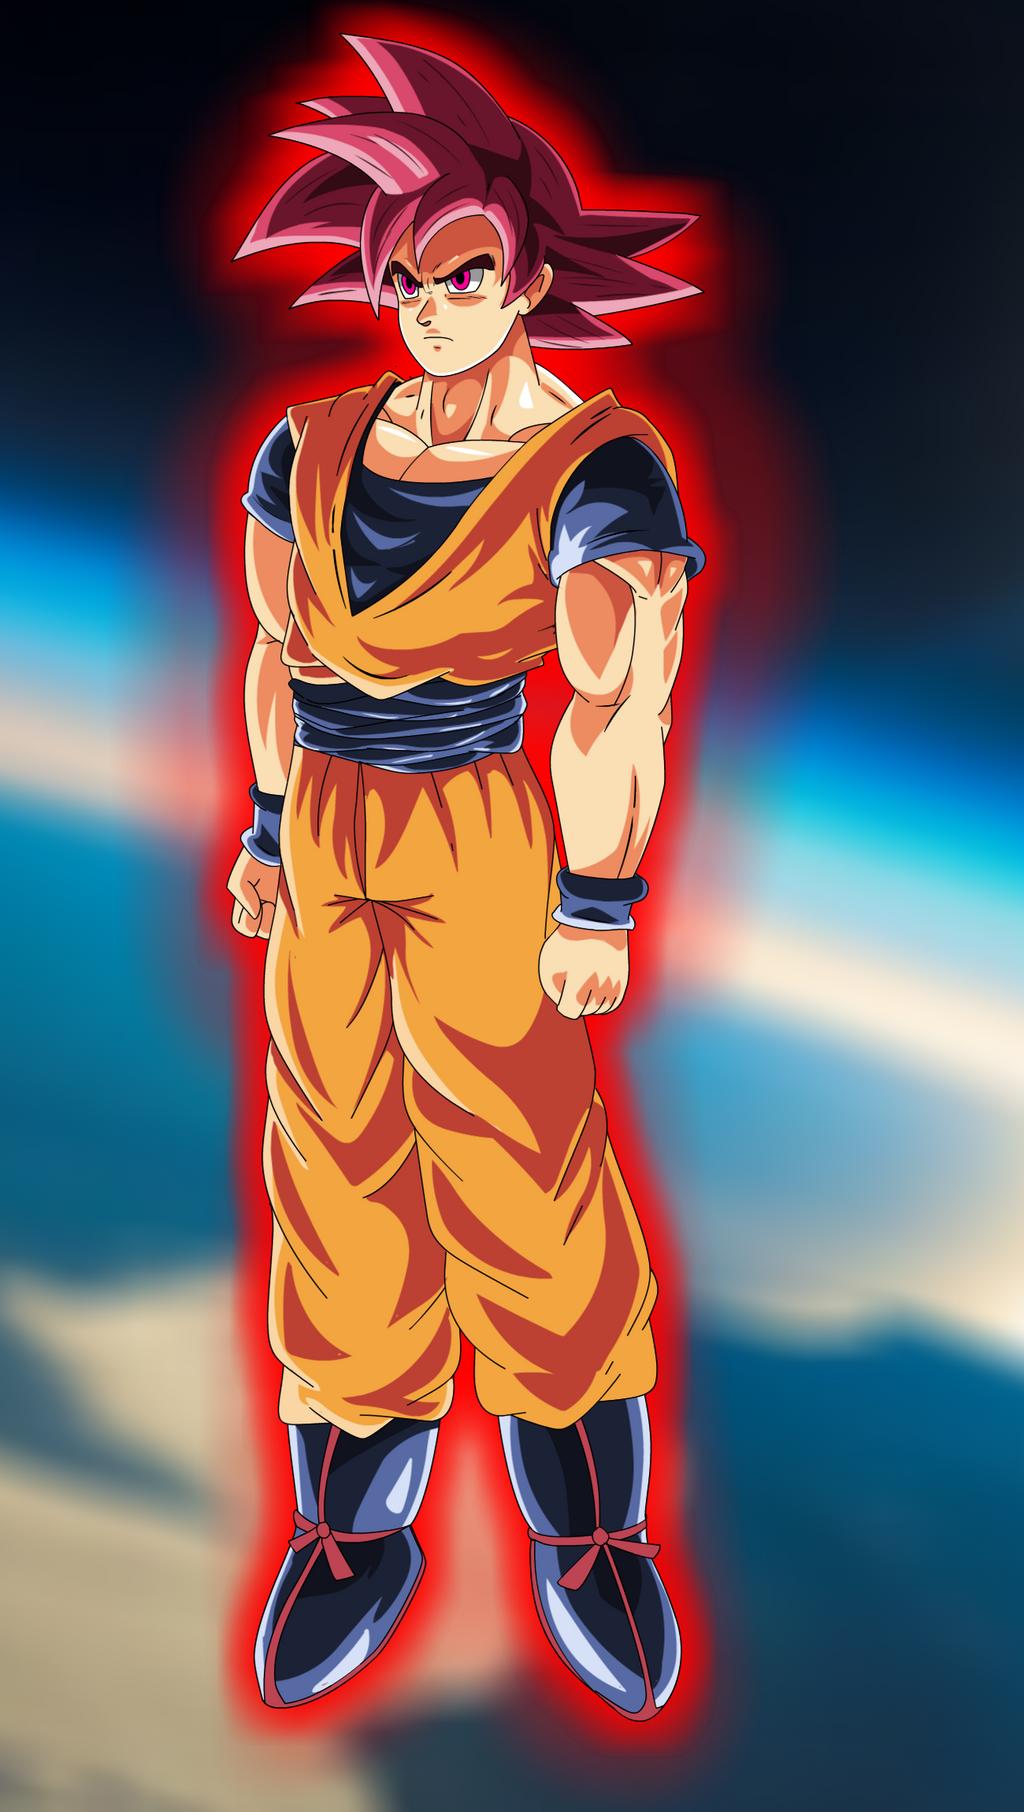 Super Saiyan God by bocodamondo